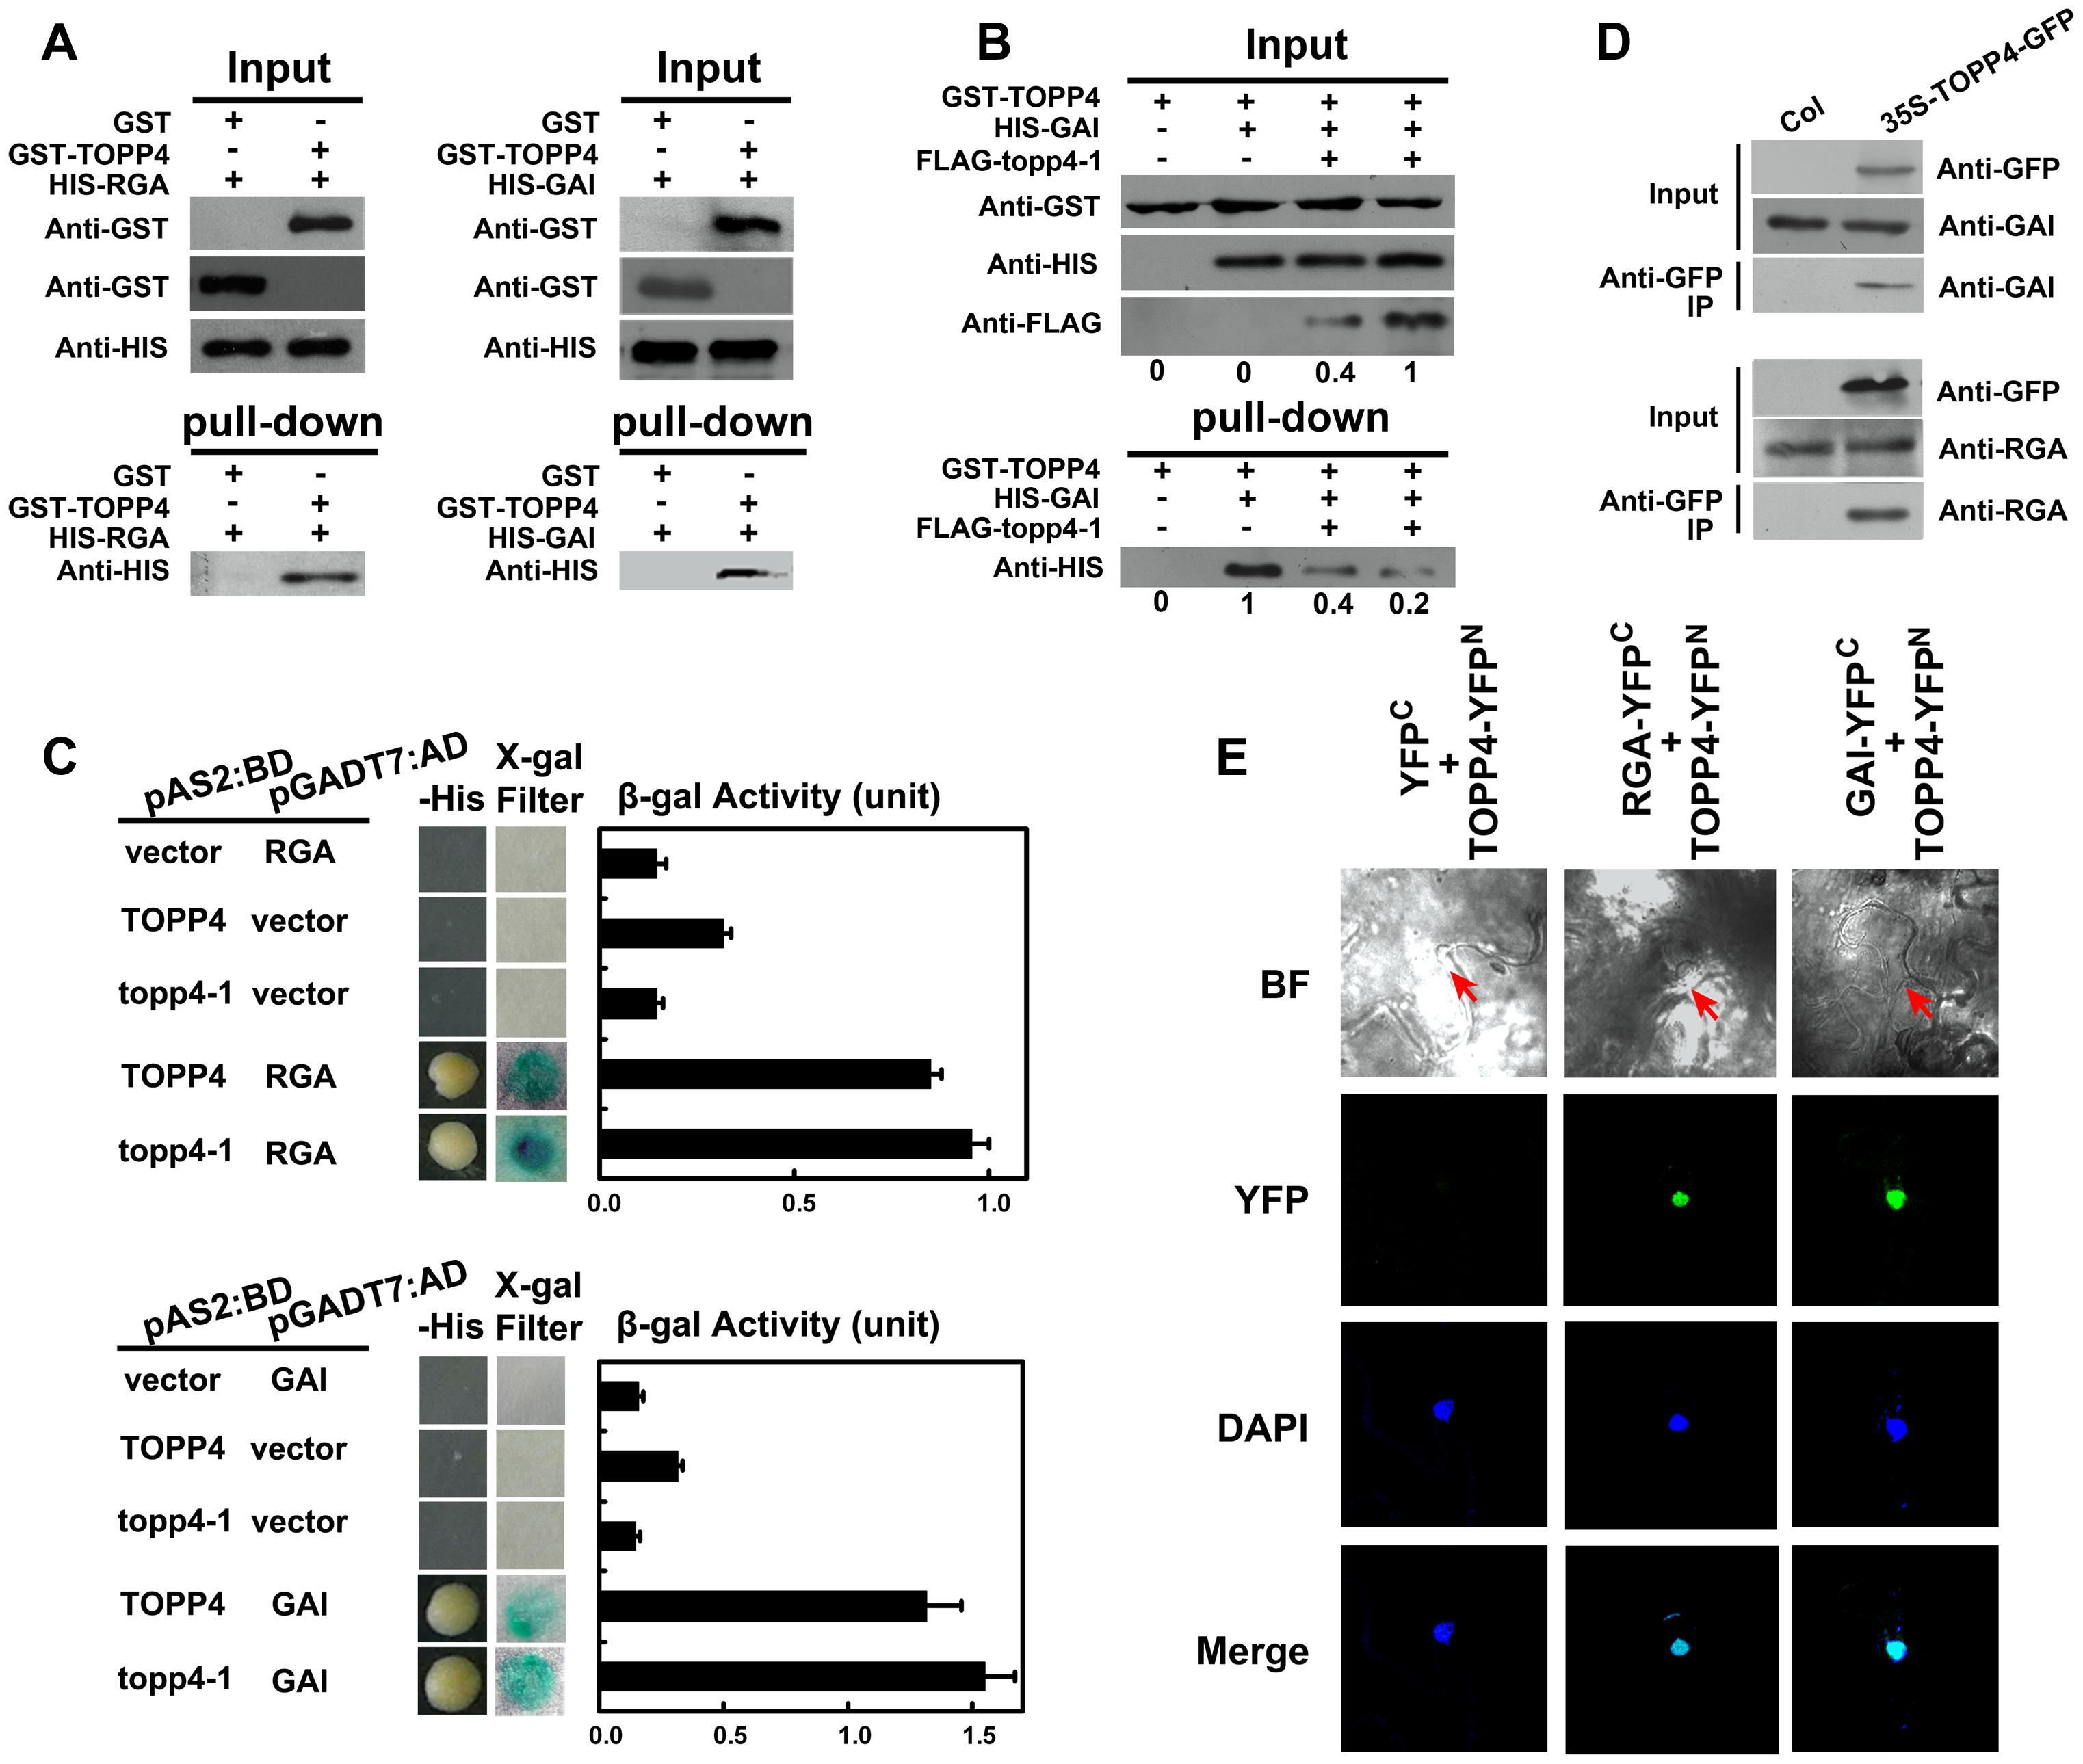 TOPP4 can interact with RGA and GAI both <i>in vitro</i> and <i>in vivo</i>.